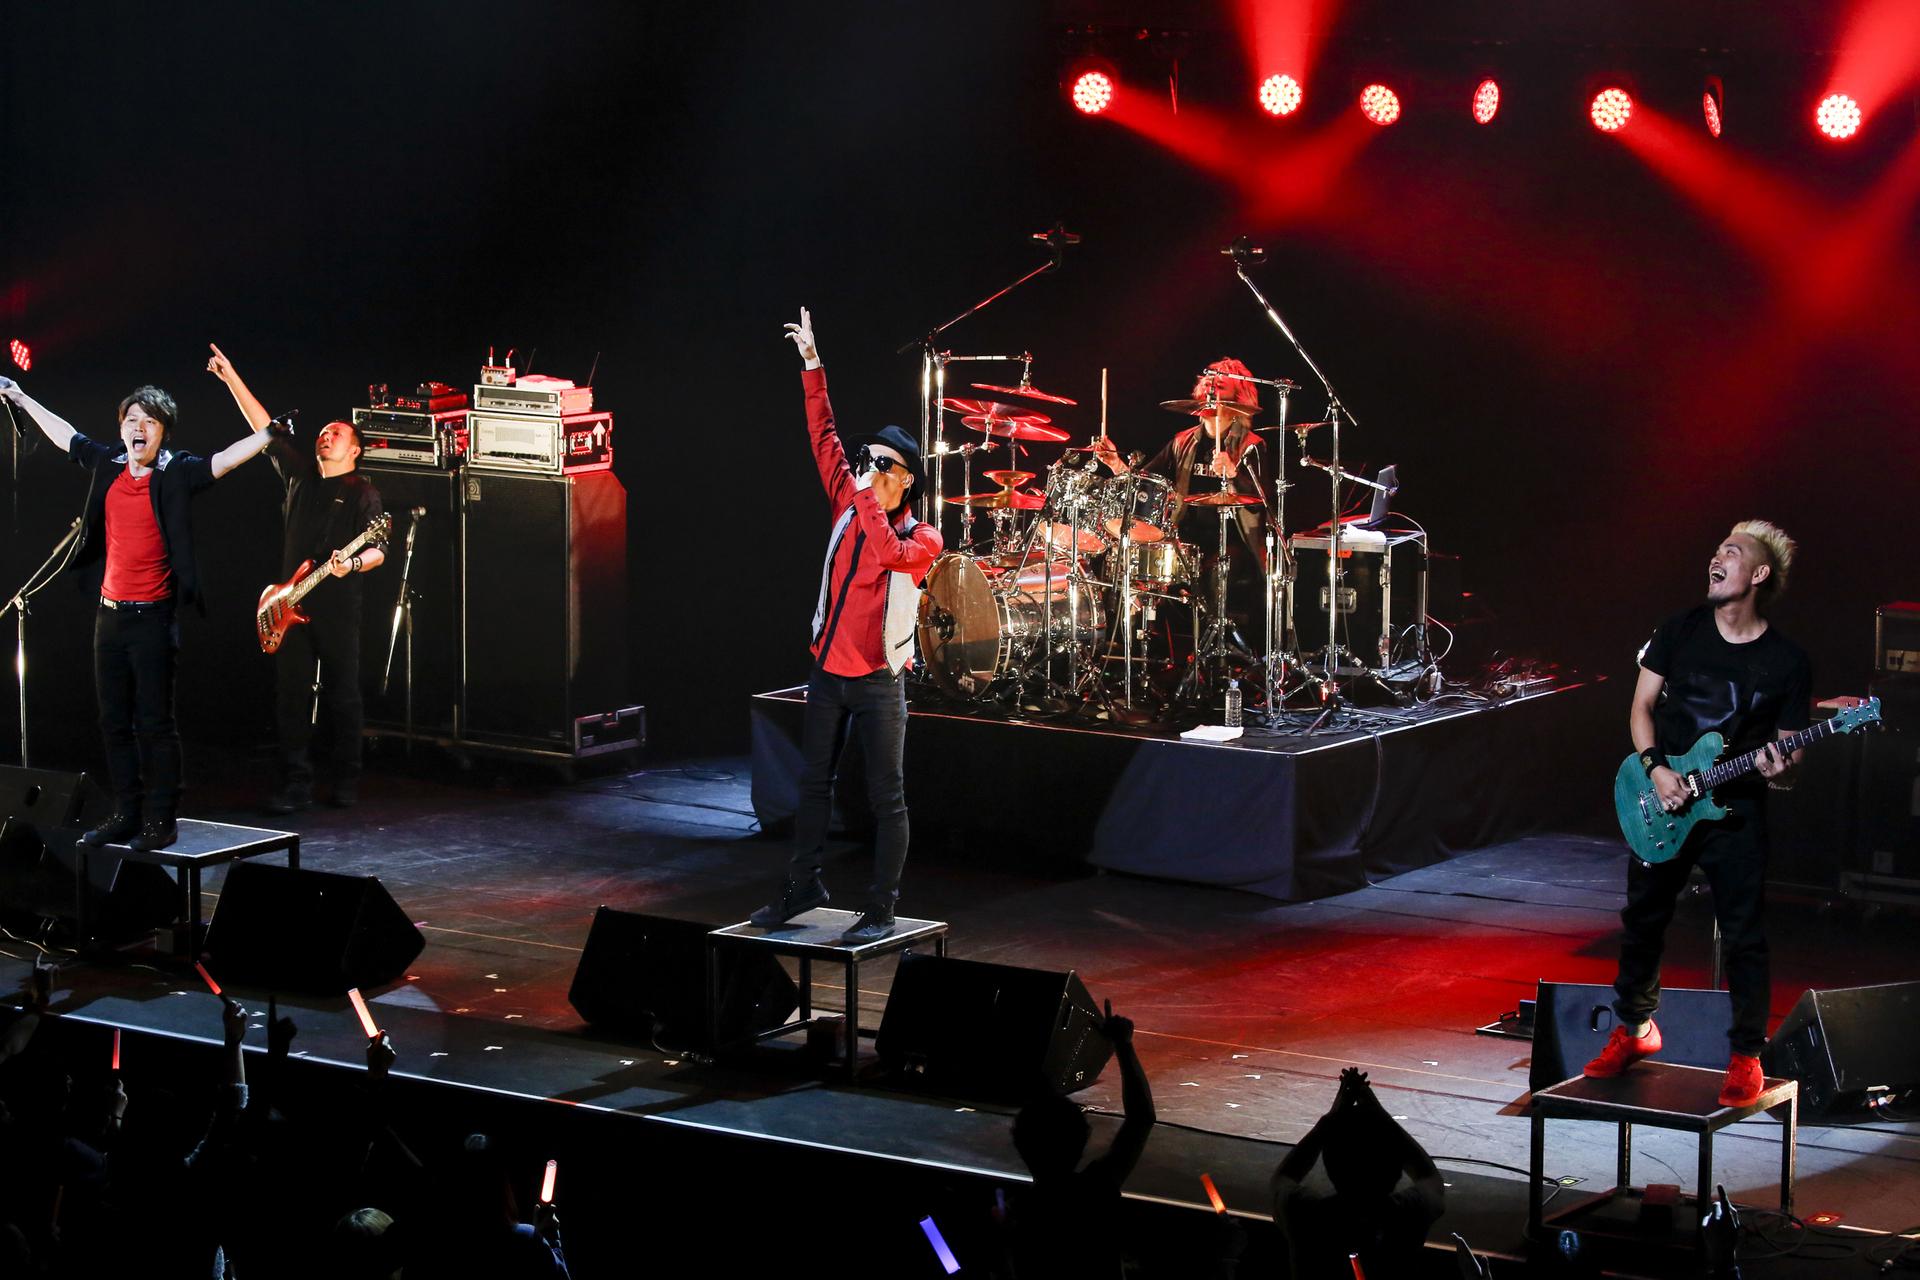 FLOW_NARUTO Live 03